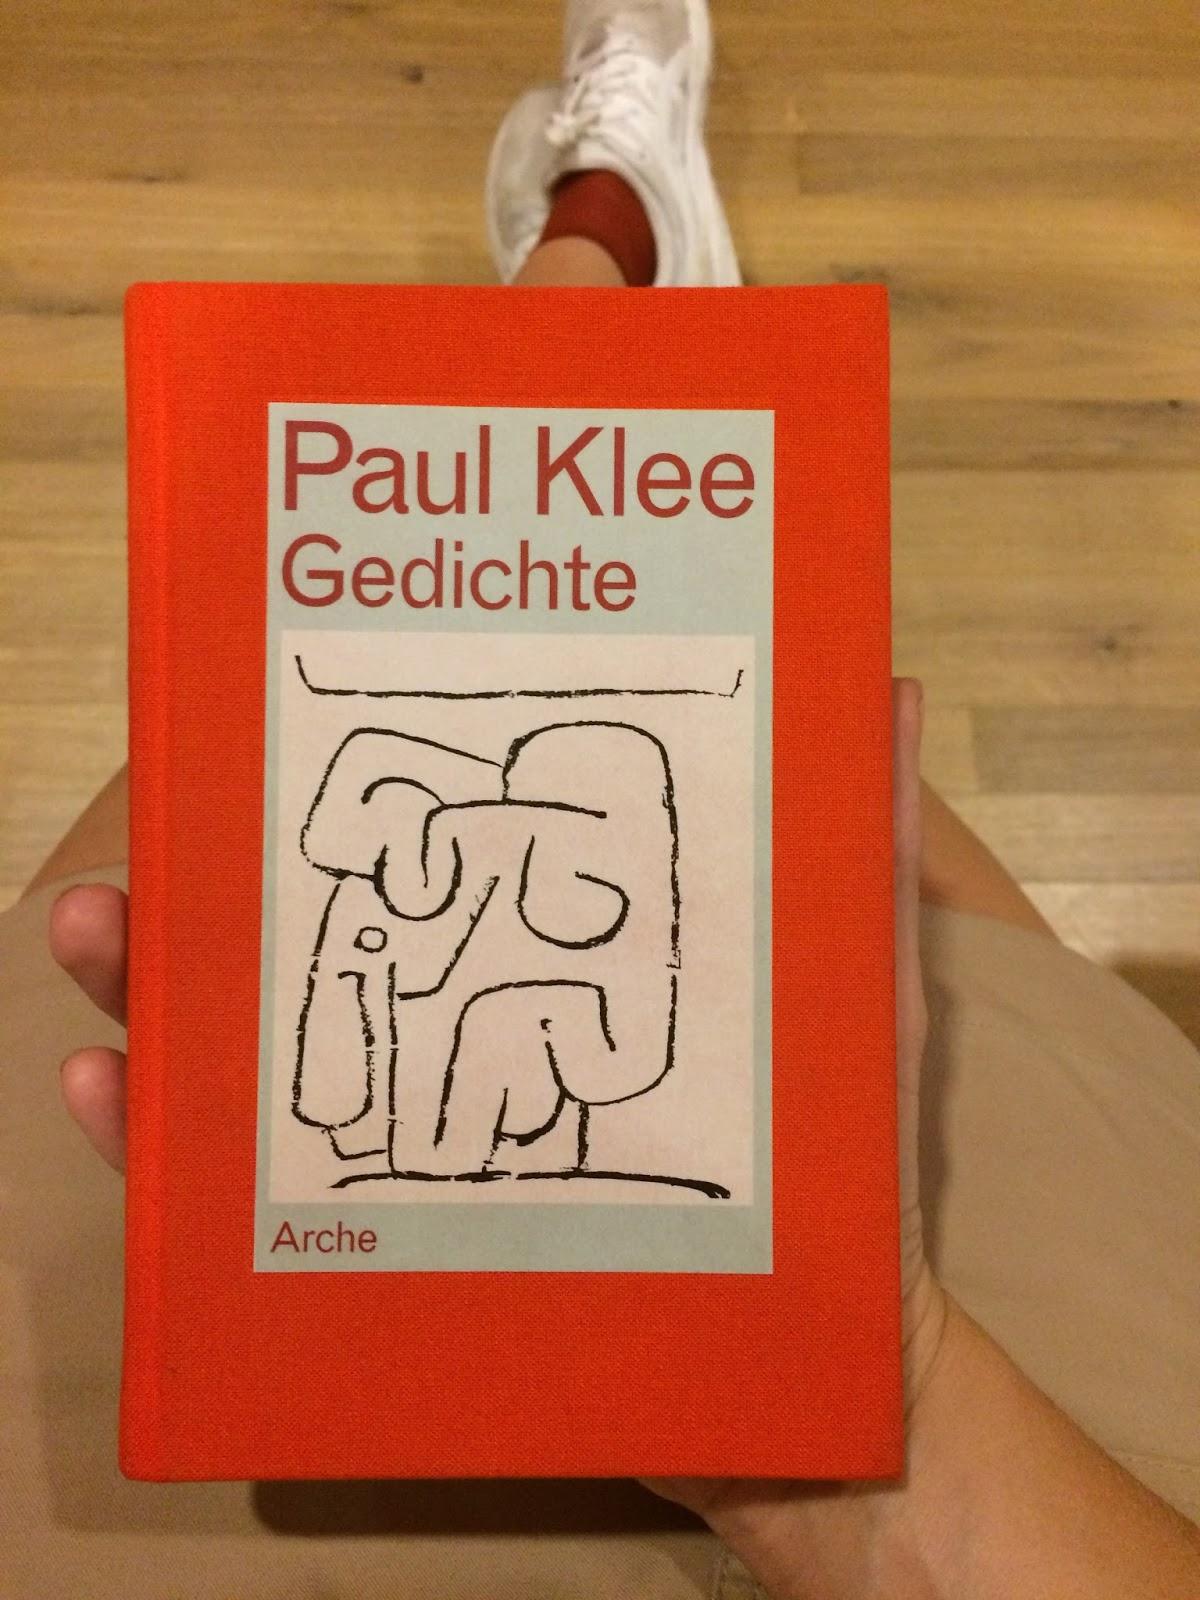 Hoolawhoop Paul Klee In Books And Titles